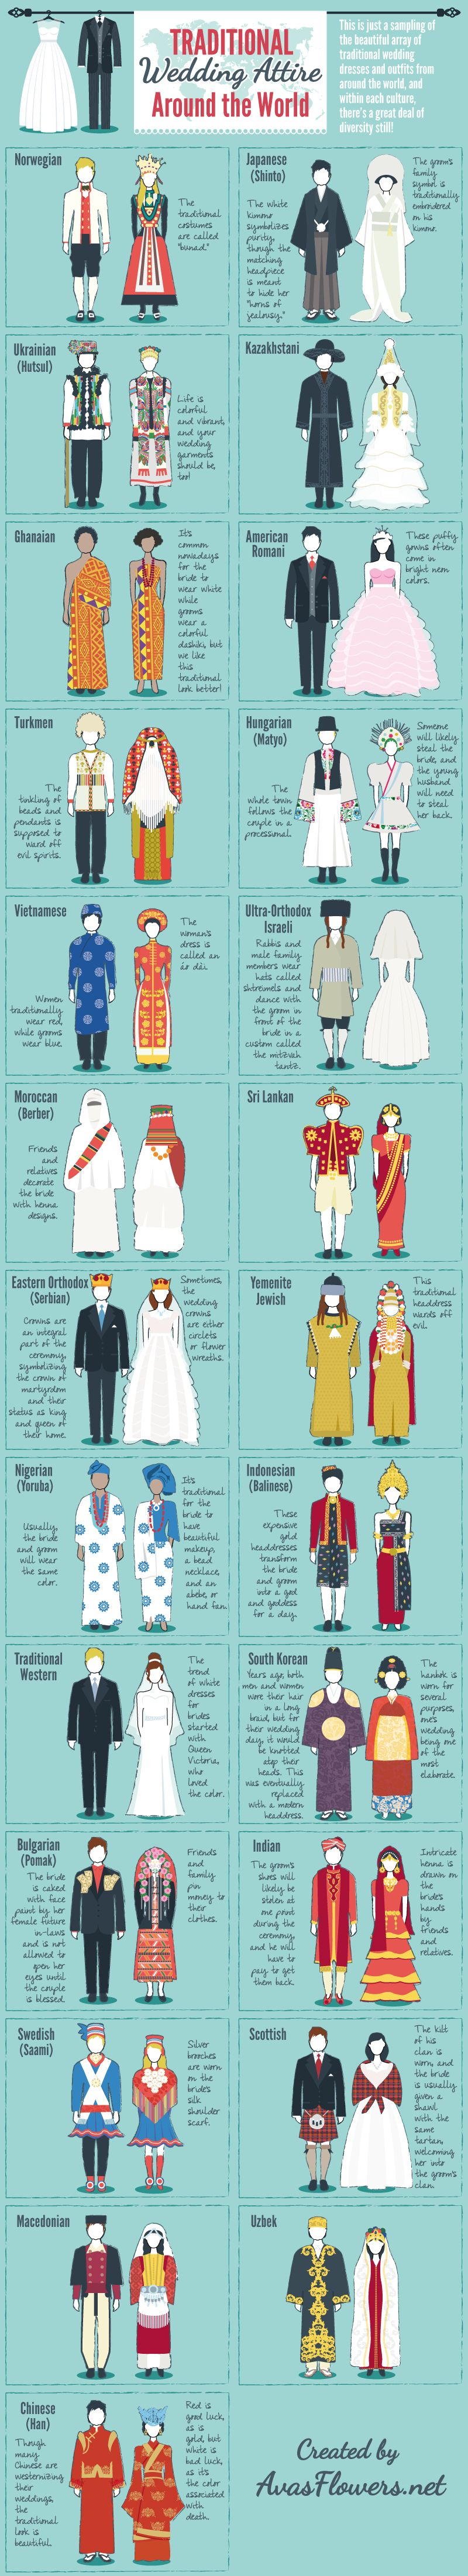 Traditional wedding attire around the world random coolness